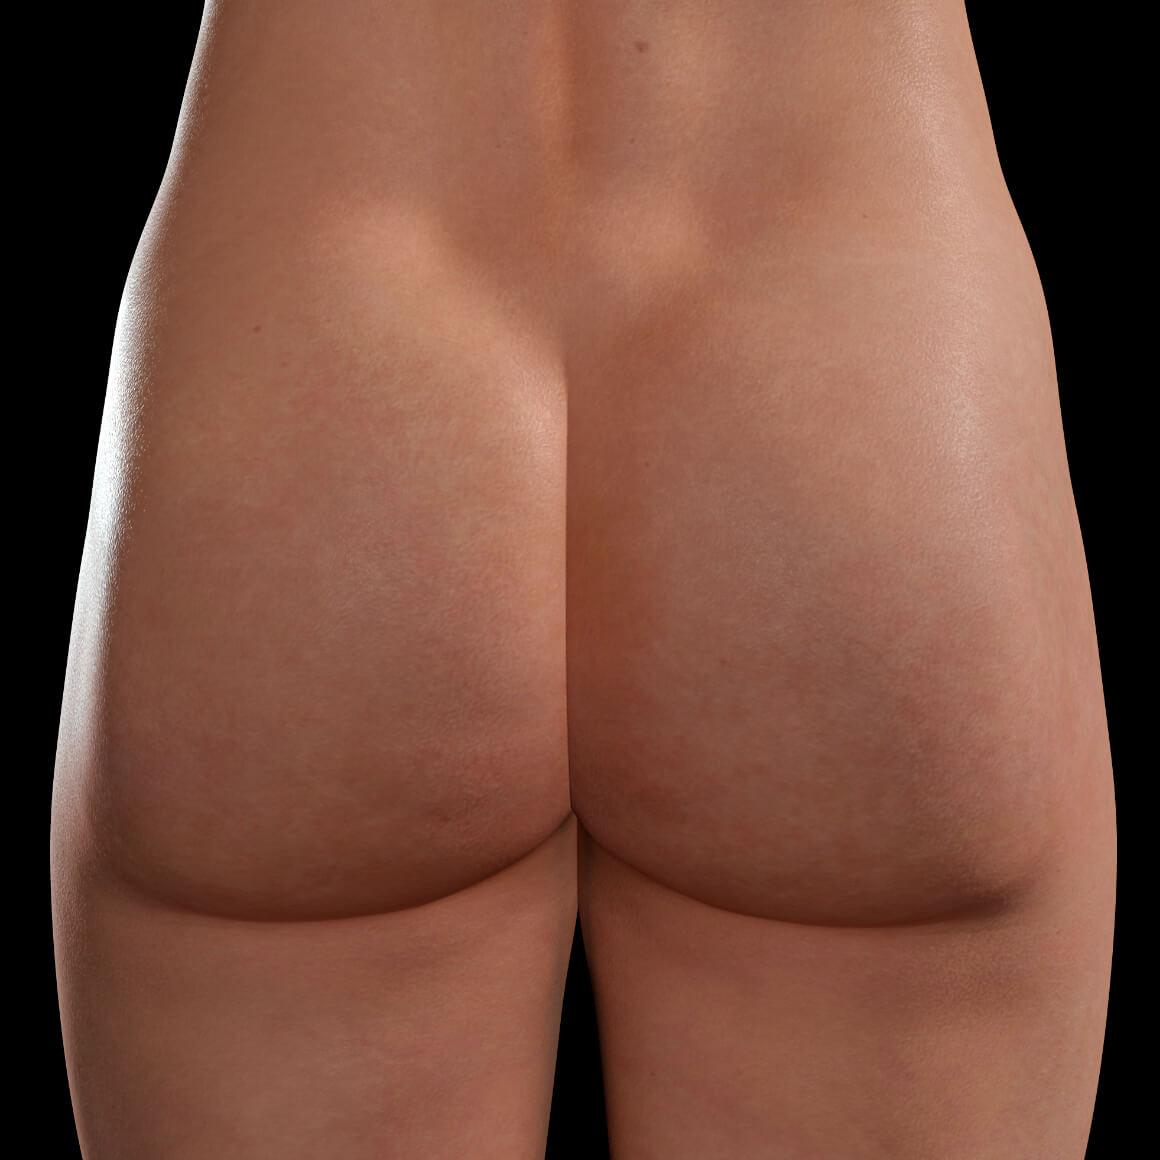 Buttocks of a Clinique Chloé female patient after Sculptra injections for cellulite treatment